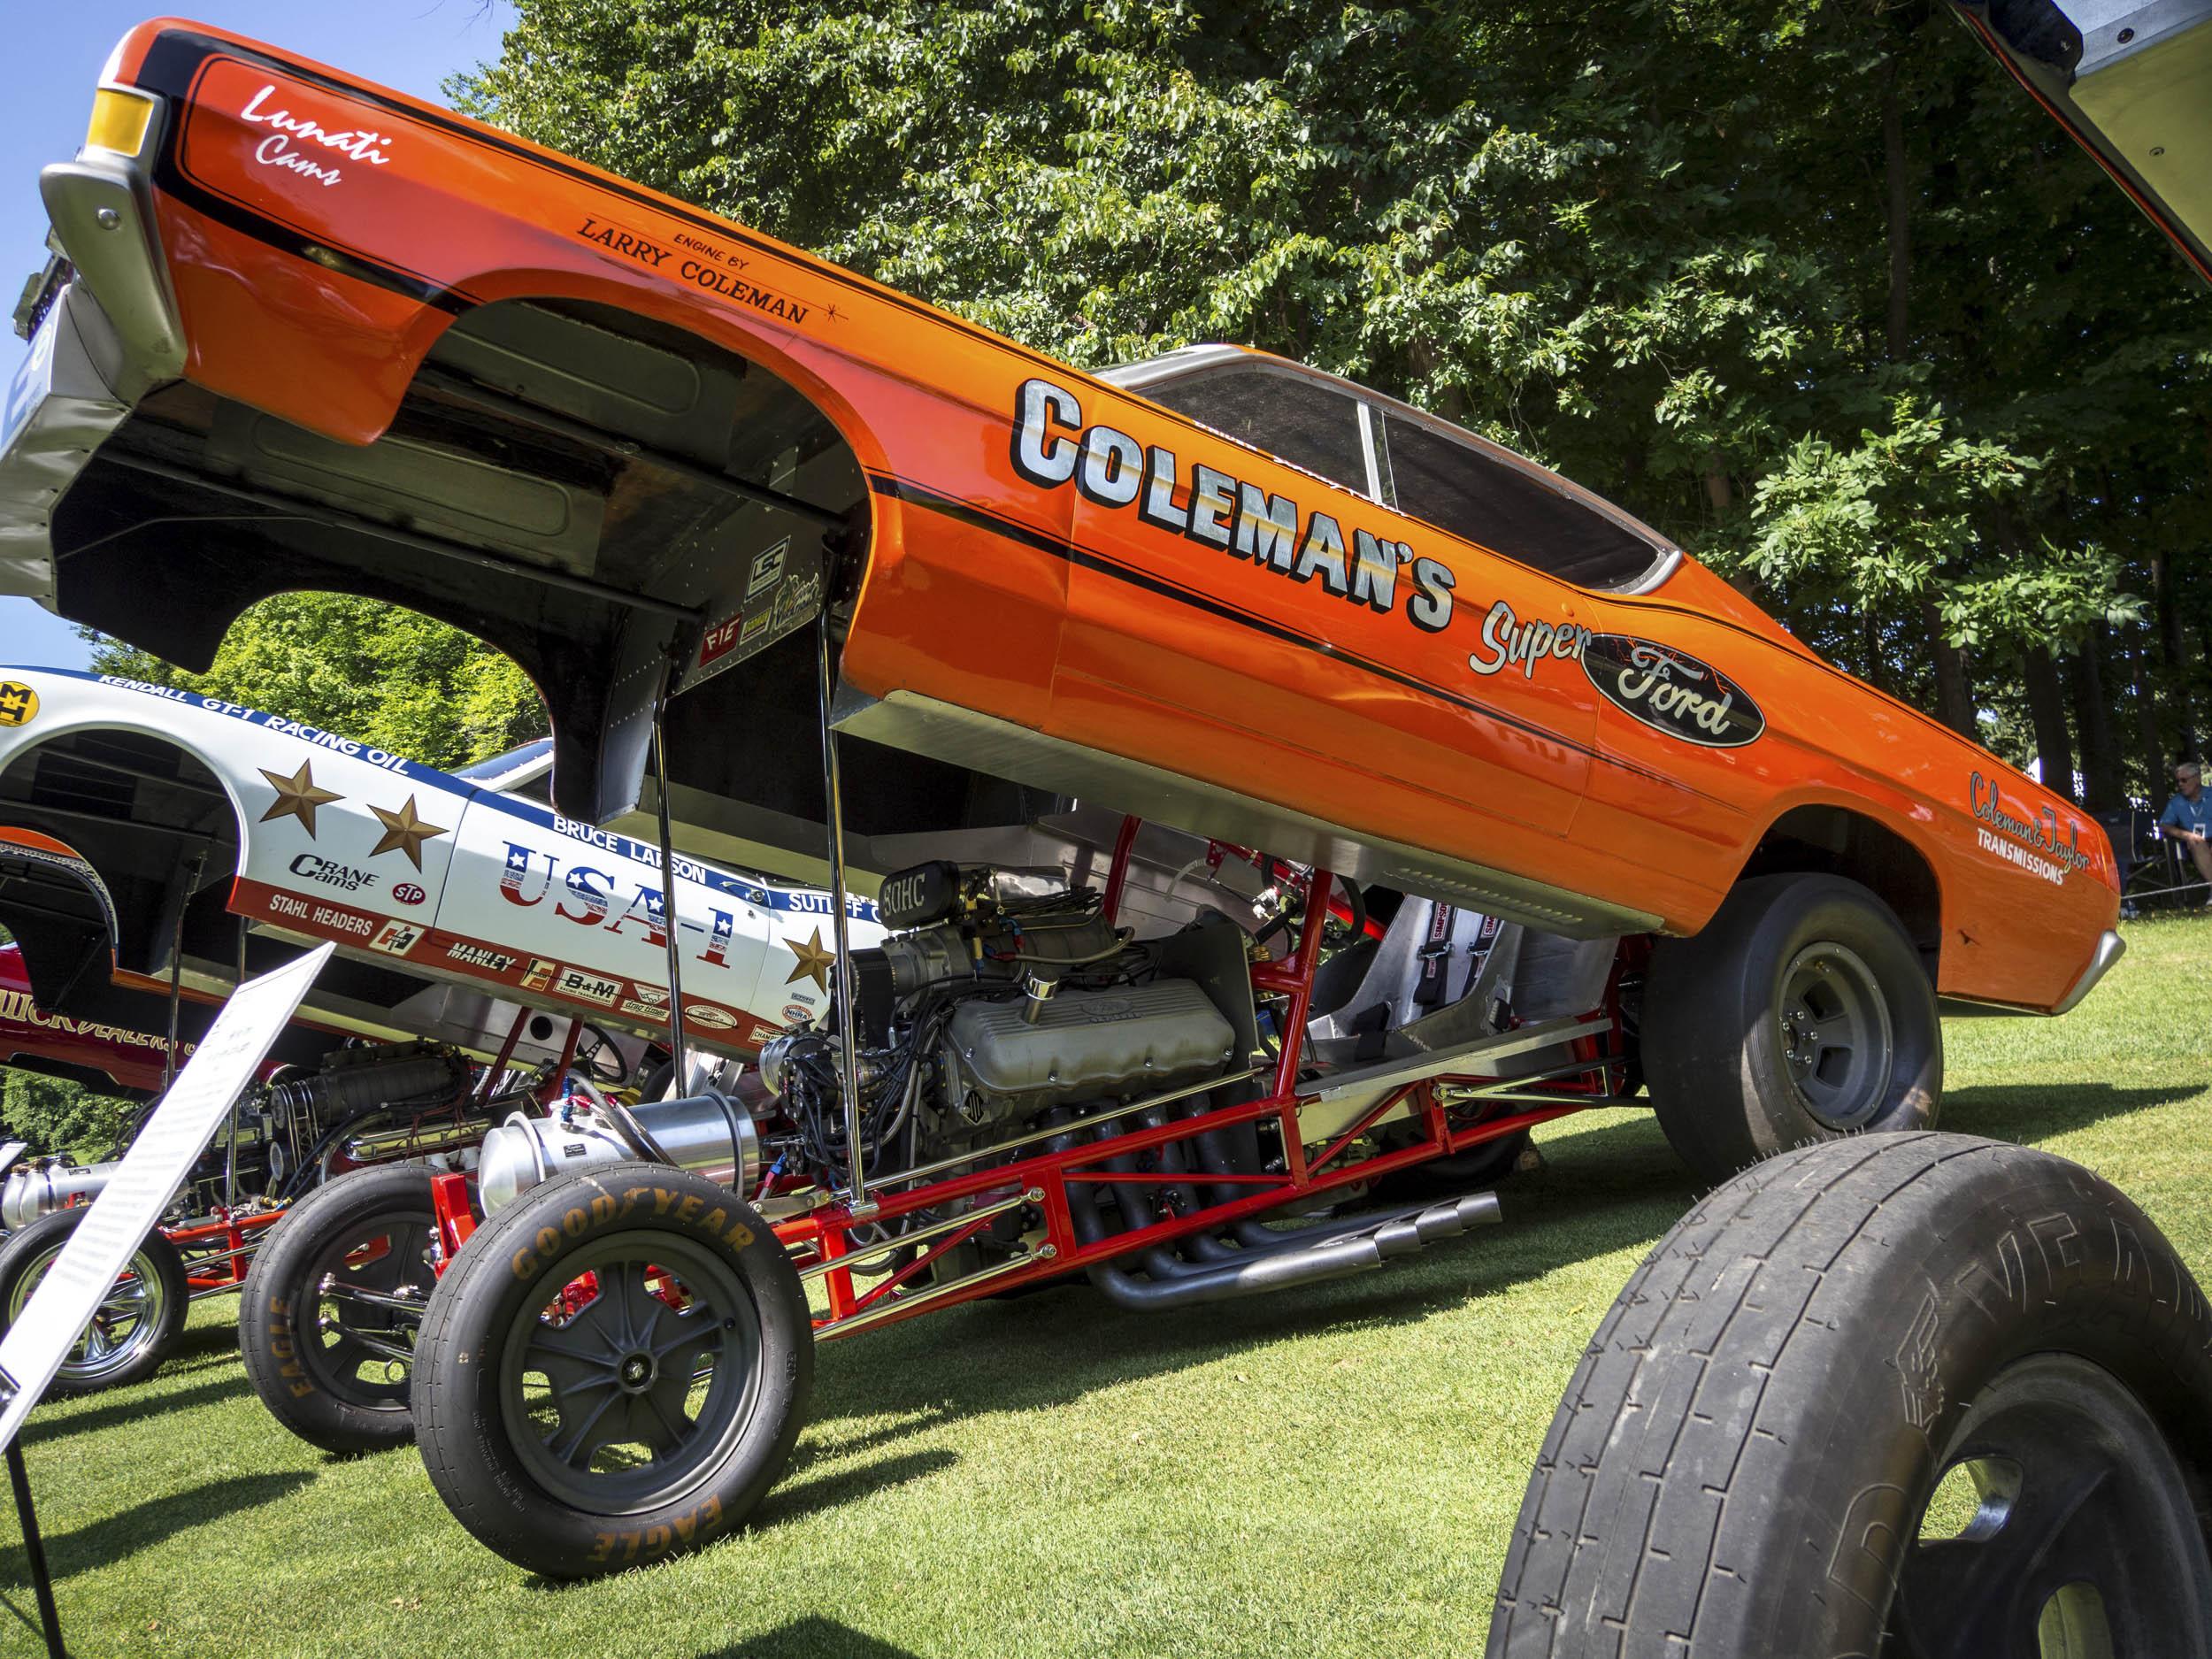 1968 Ford Torino Funny Car